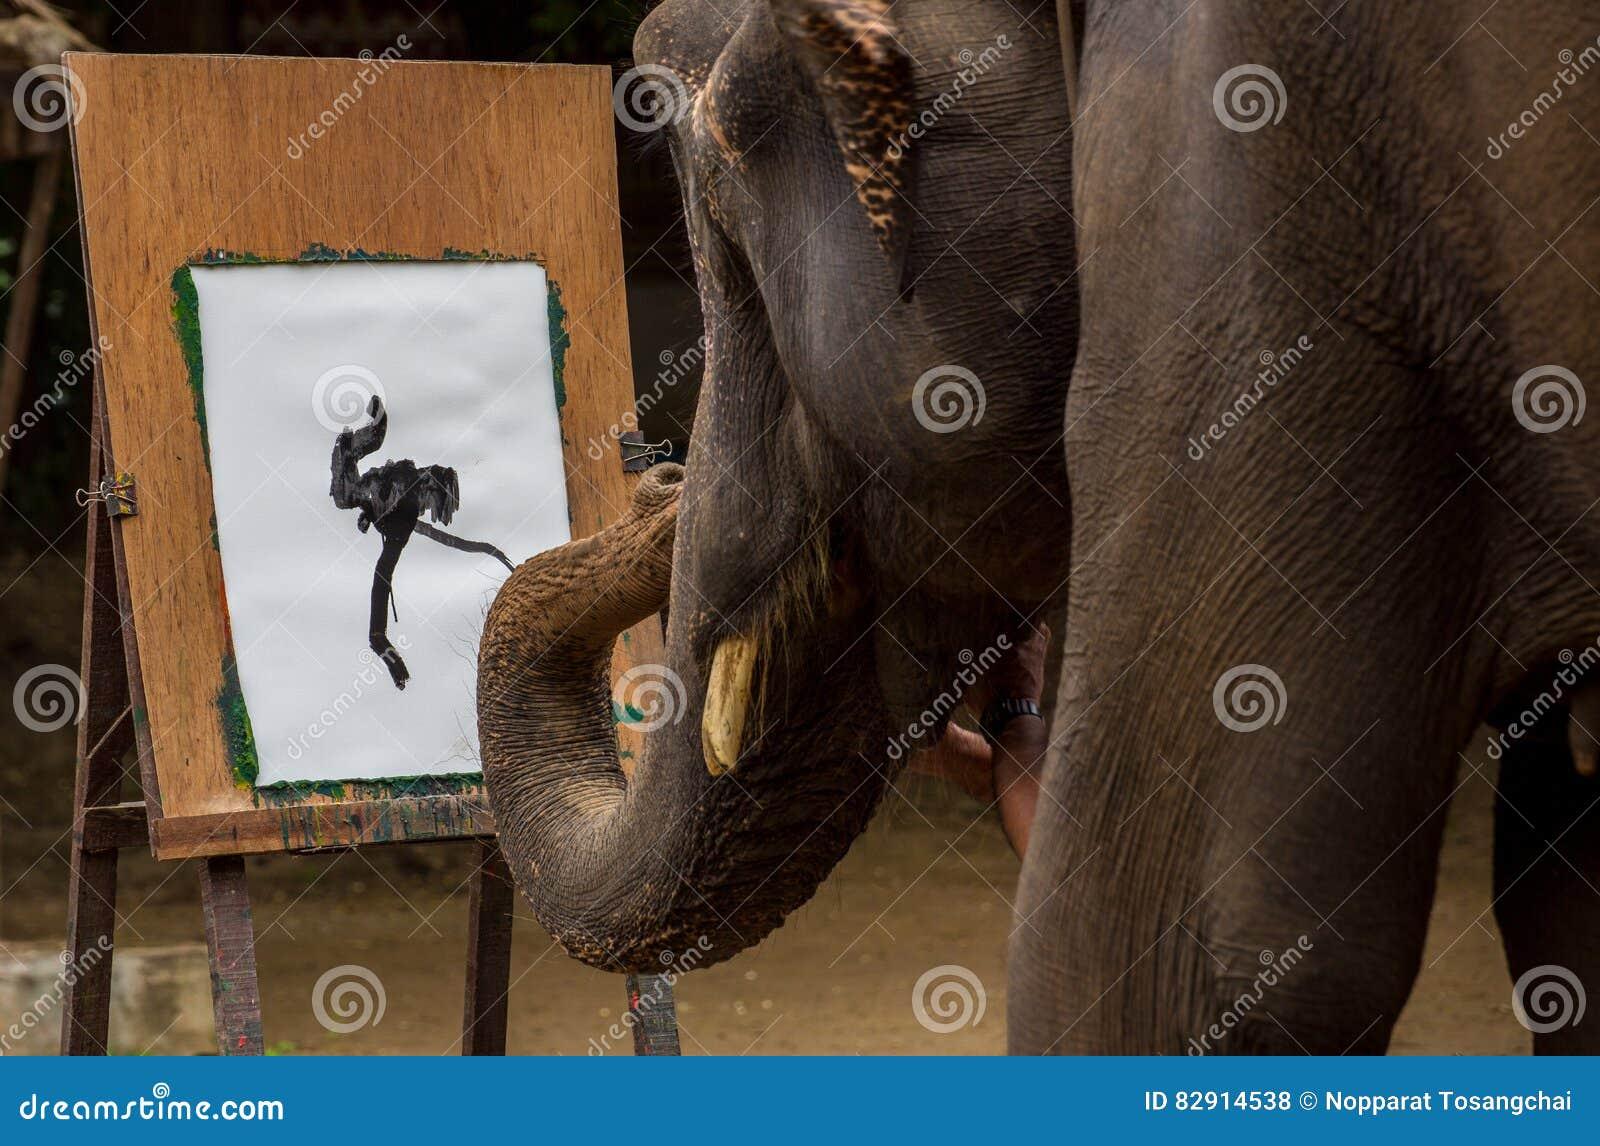 Elephant is drawing art